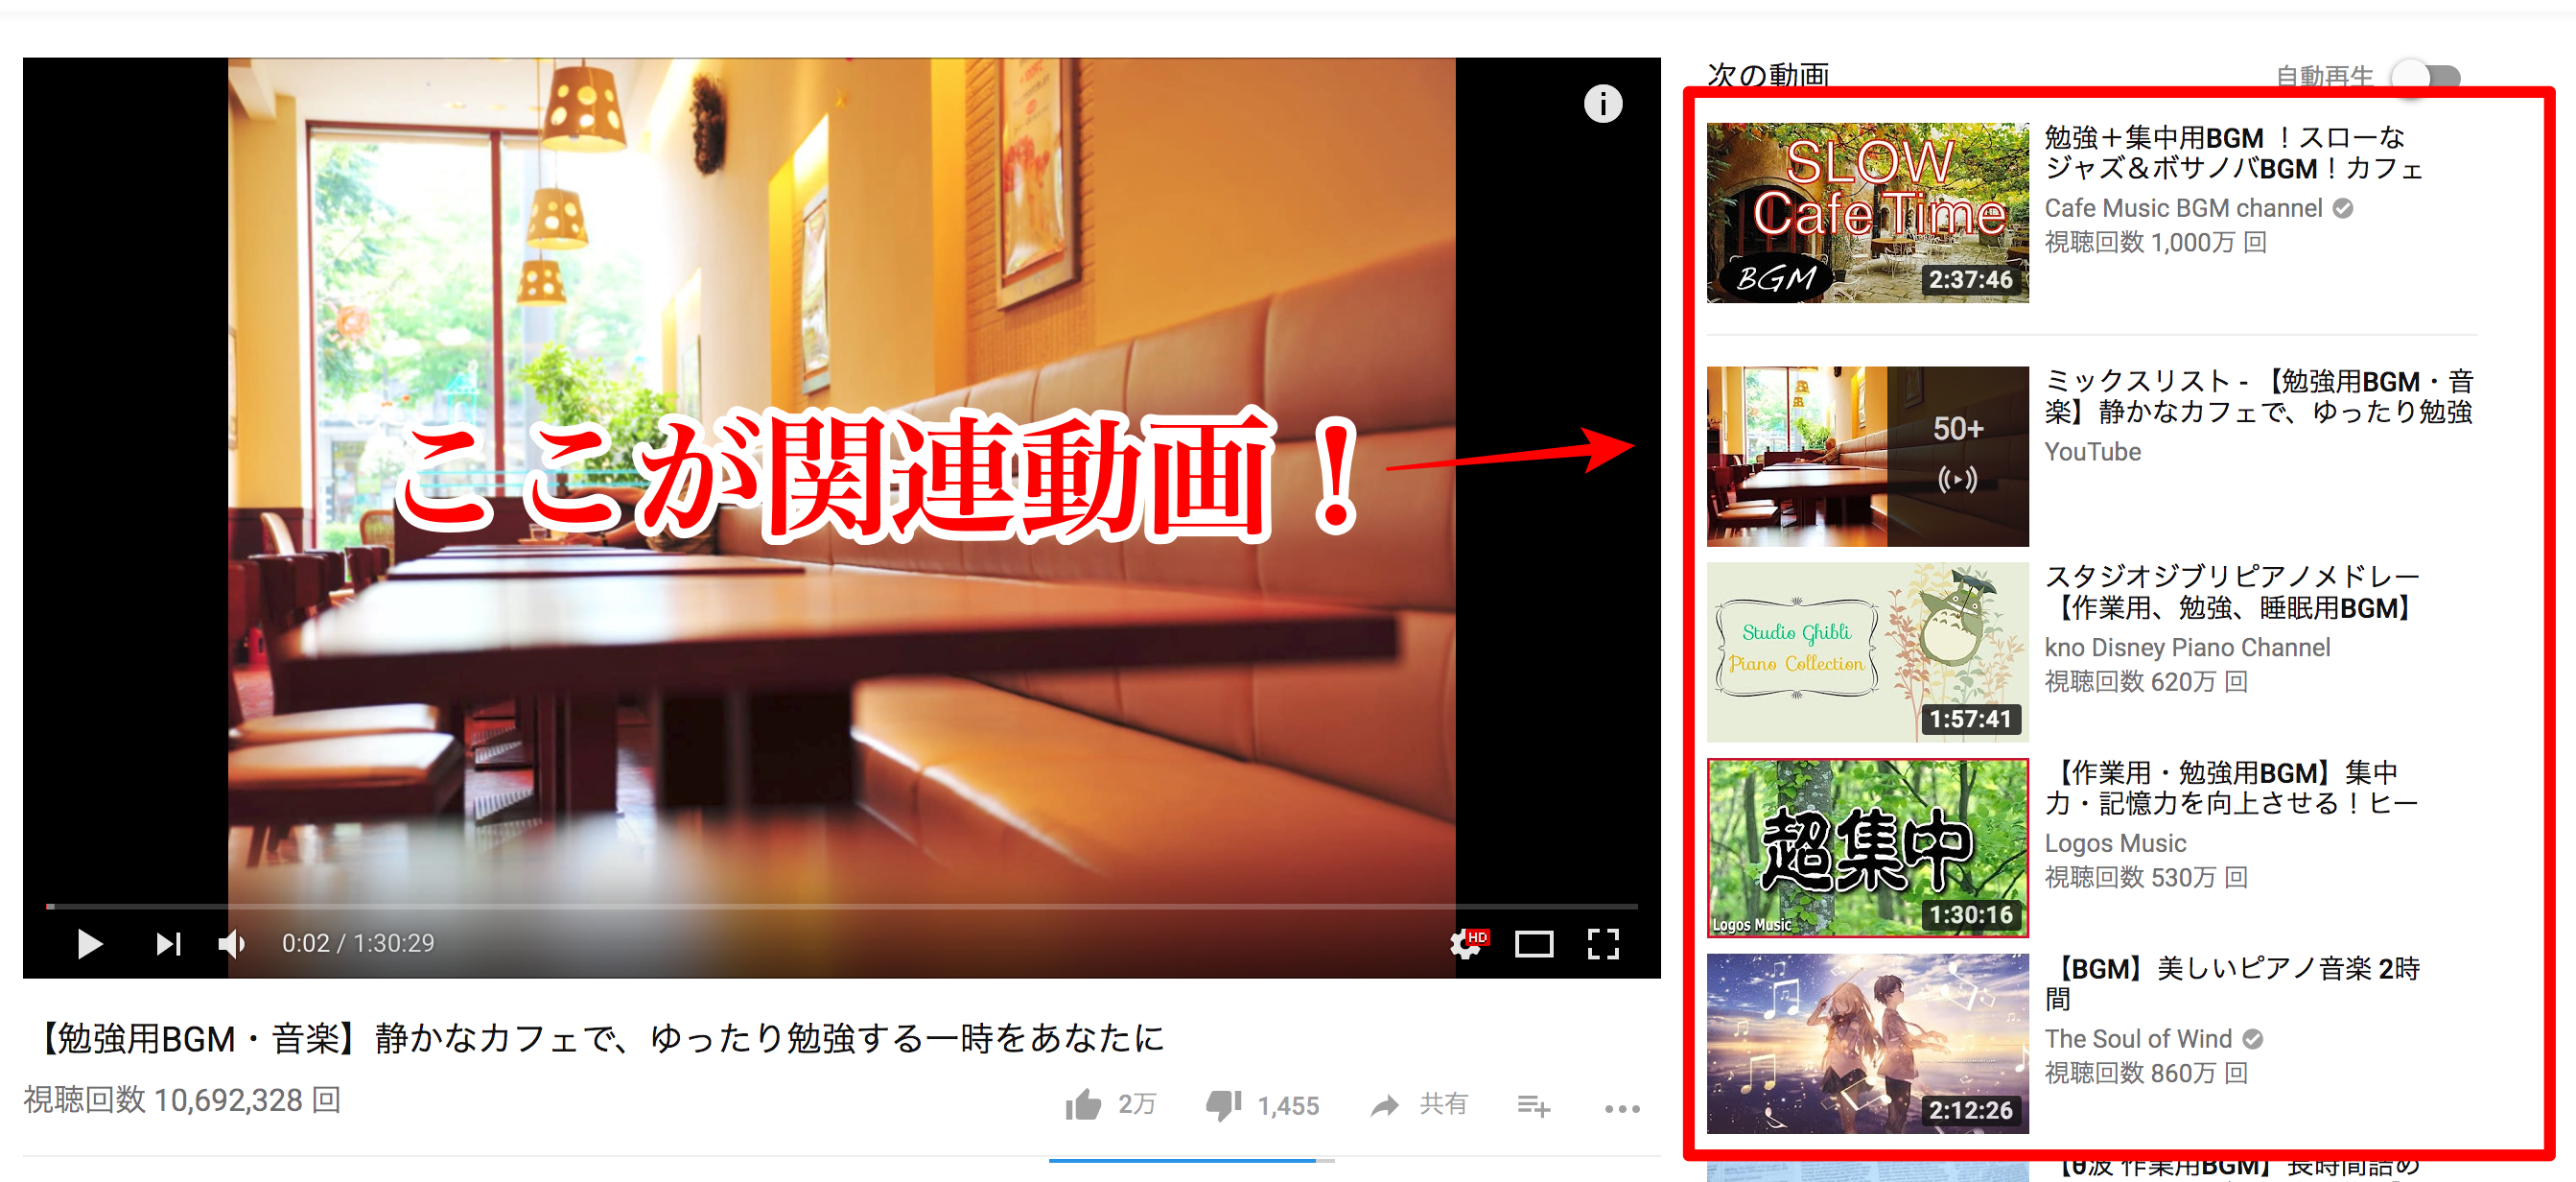 YouTubeで稼ぐ方法動画SEO対策4